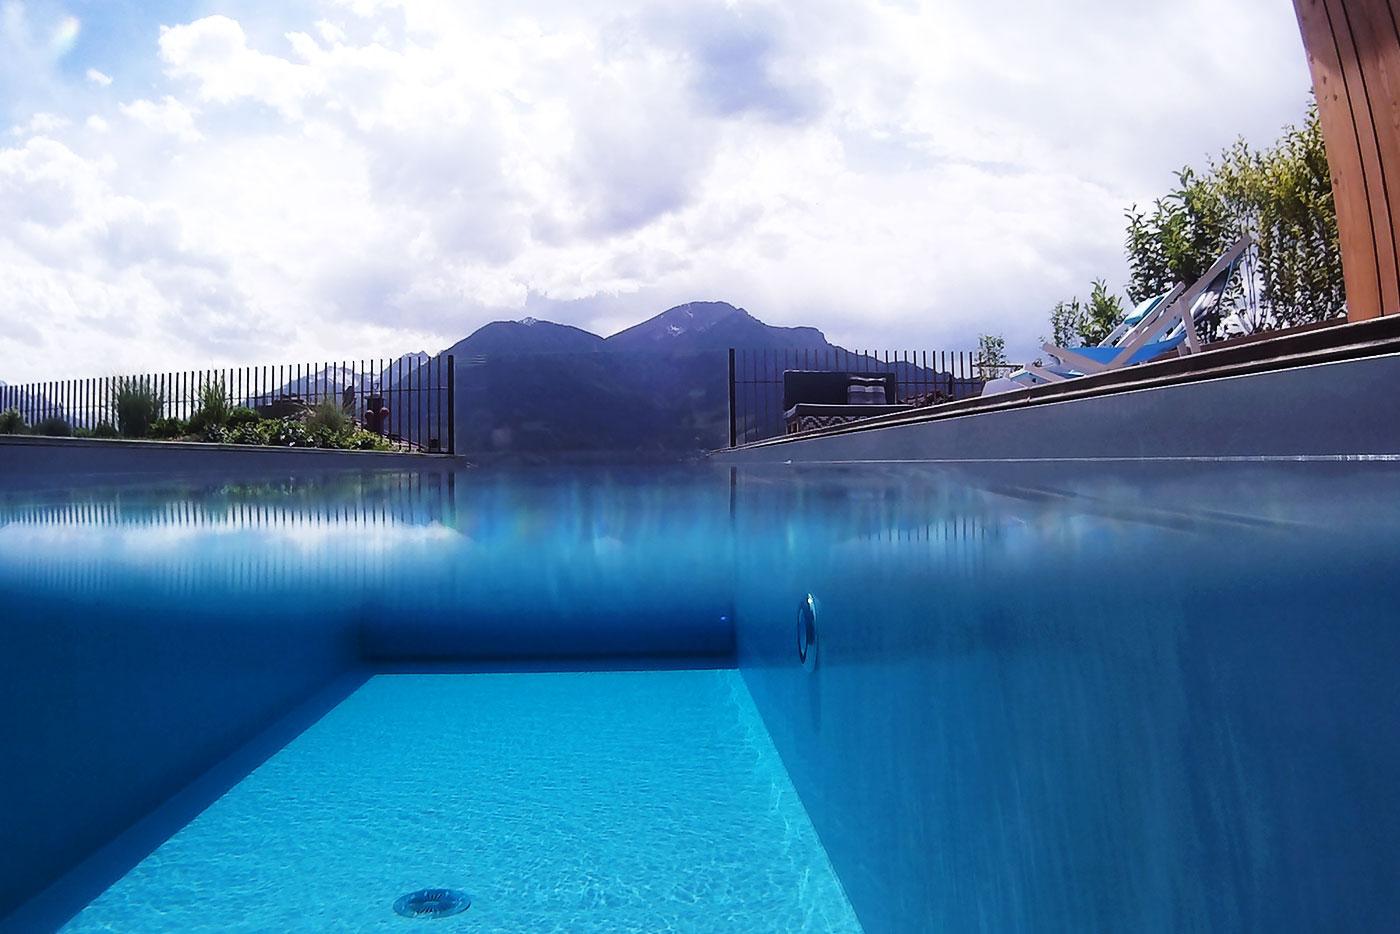 privat-a-niveko-sst-pool-referenz-05-saurwein-schwimmbad-technik